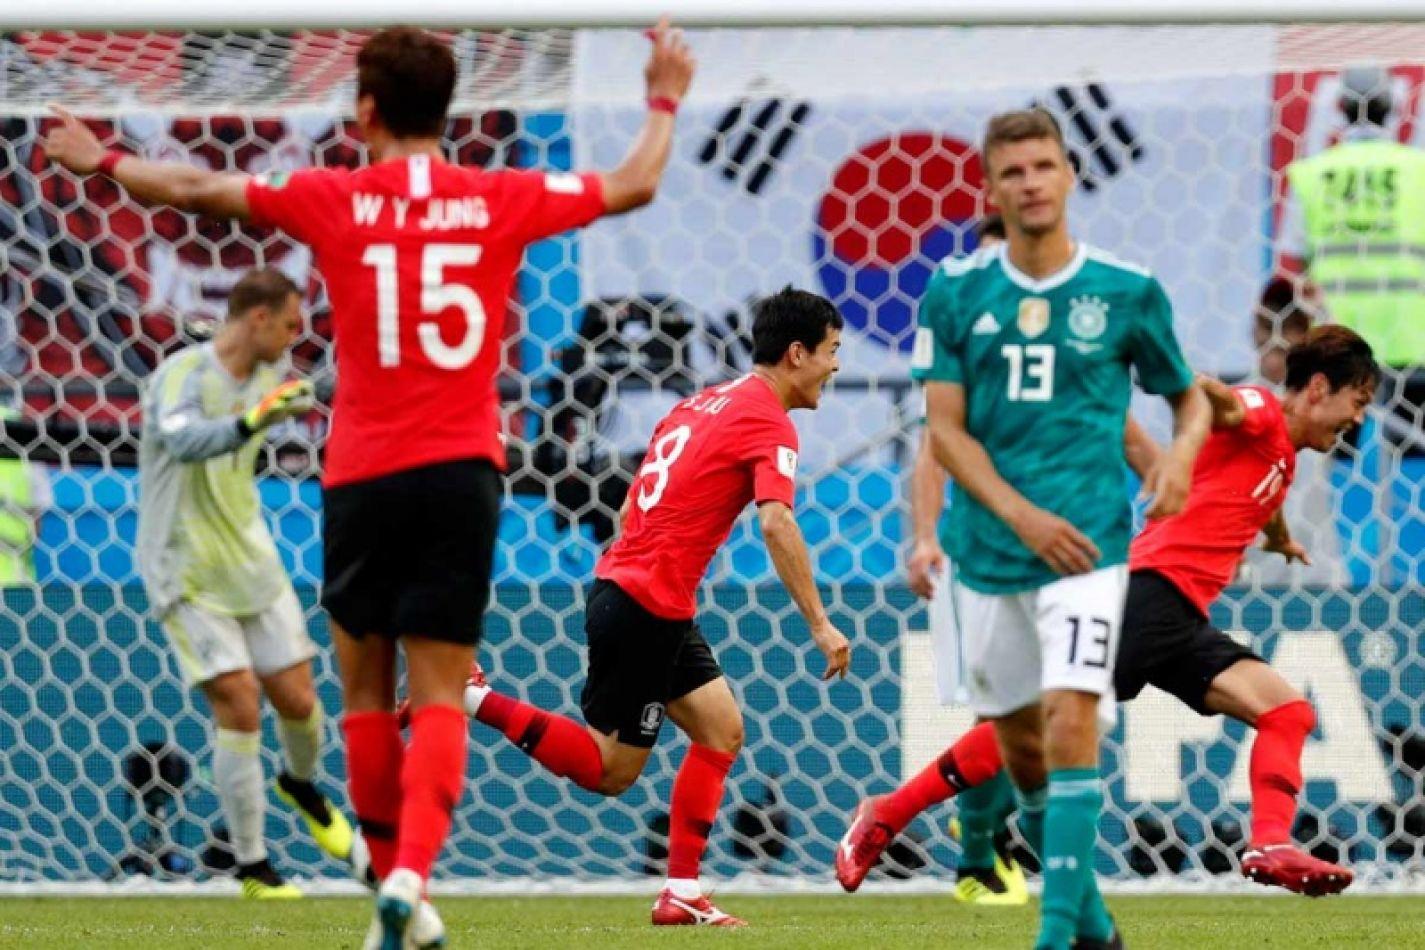 Corea festeja su logro ante Alemania